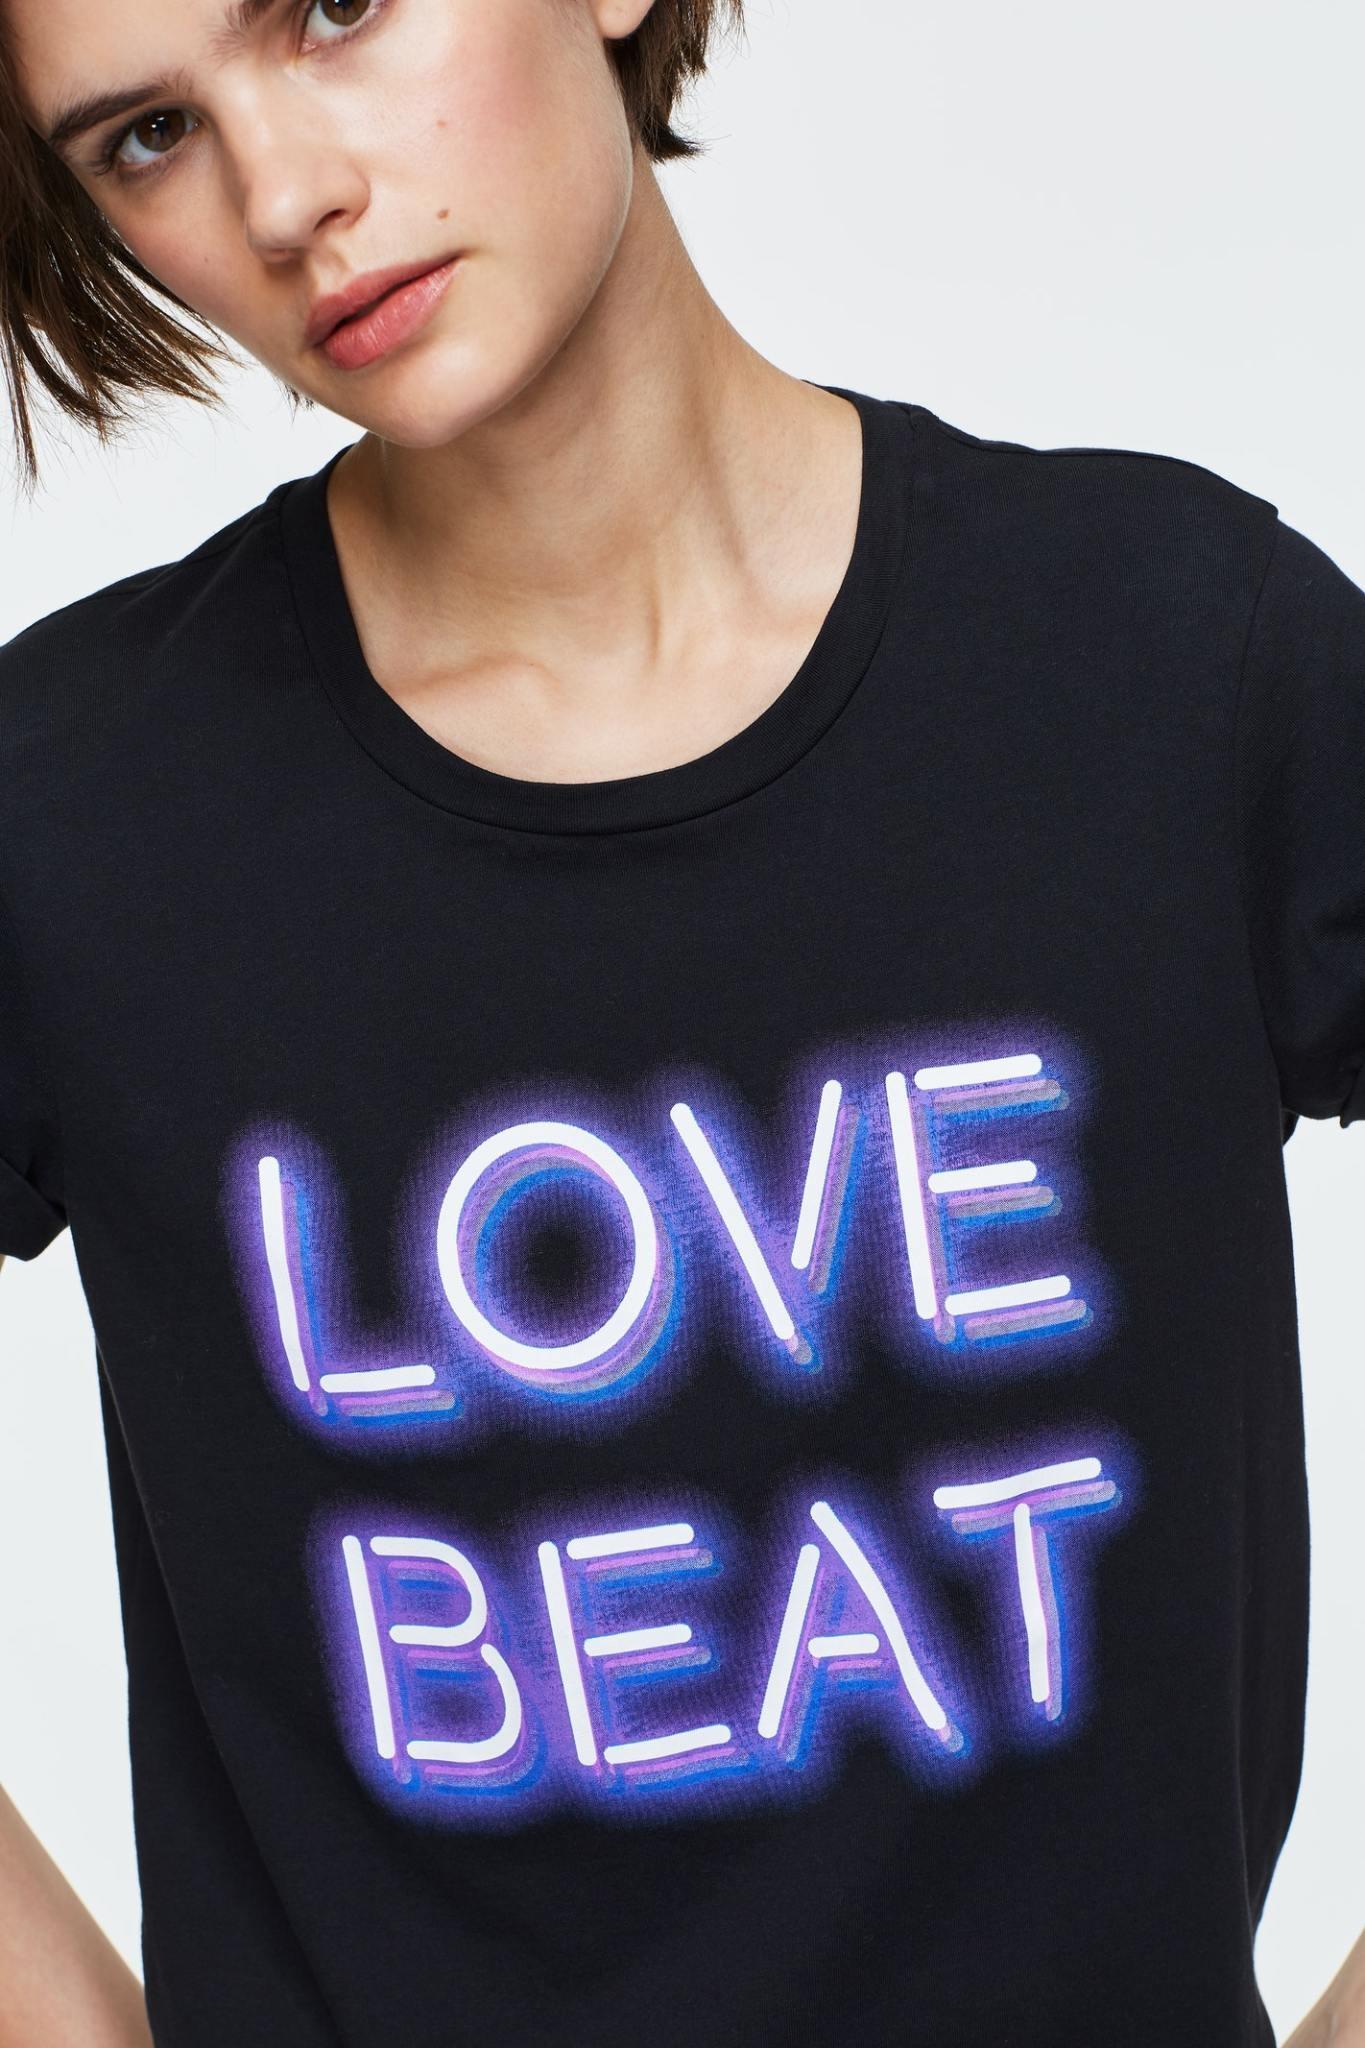 Neon love beat shirt dorothee schumacher-3